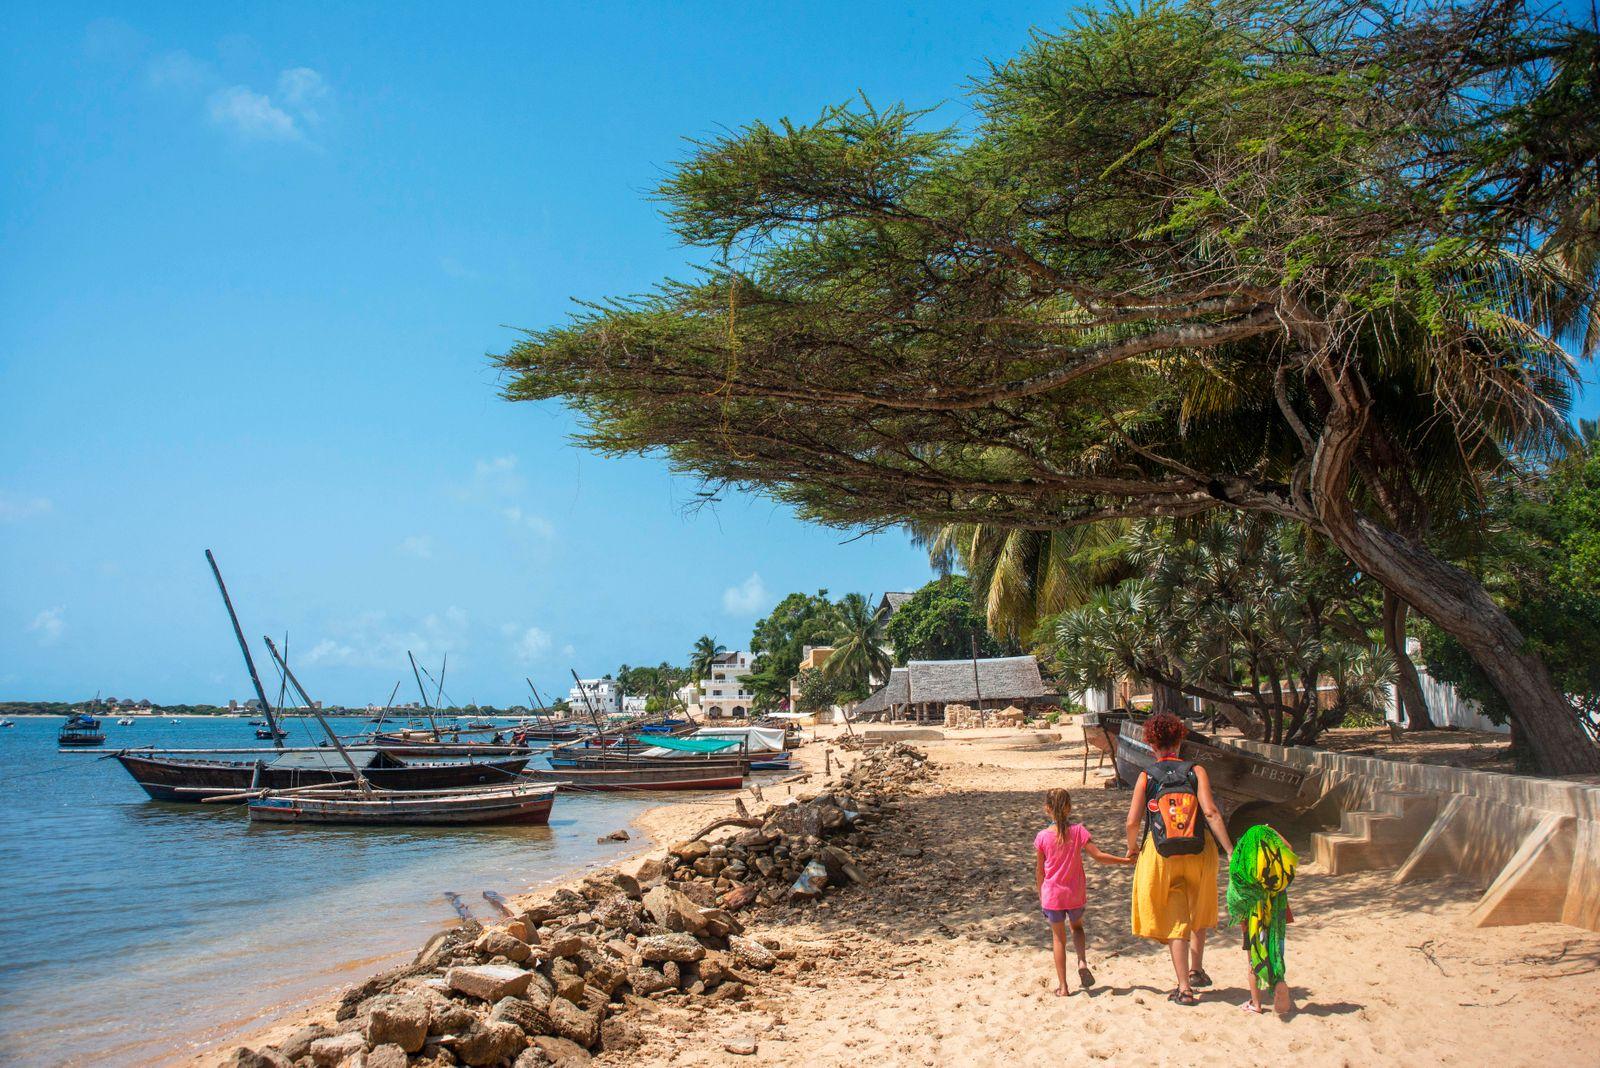 Shela beach in the south of Lamu island archipelago in Kenya Kenya Copyright: xSergixReboredox SRE-CU3729